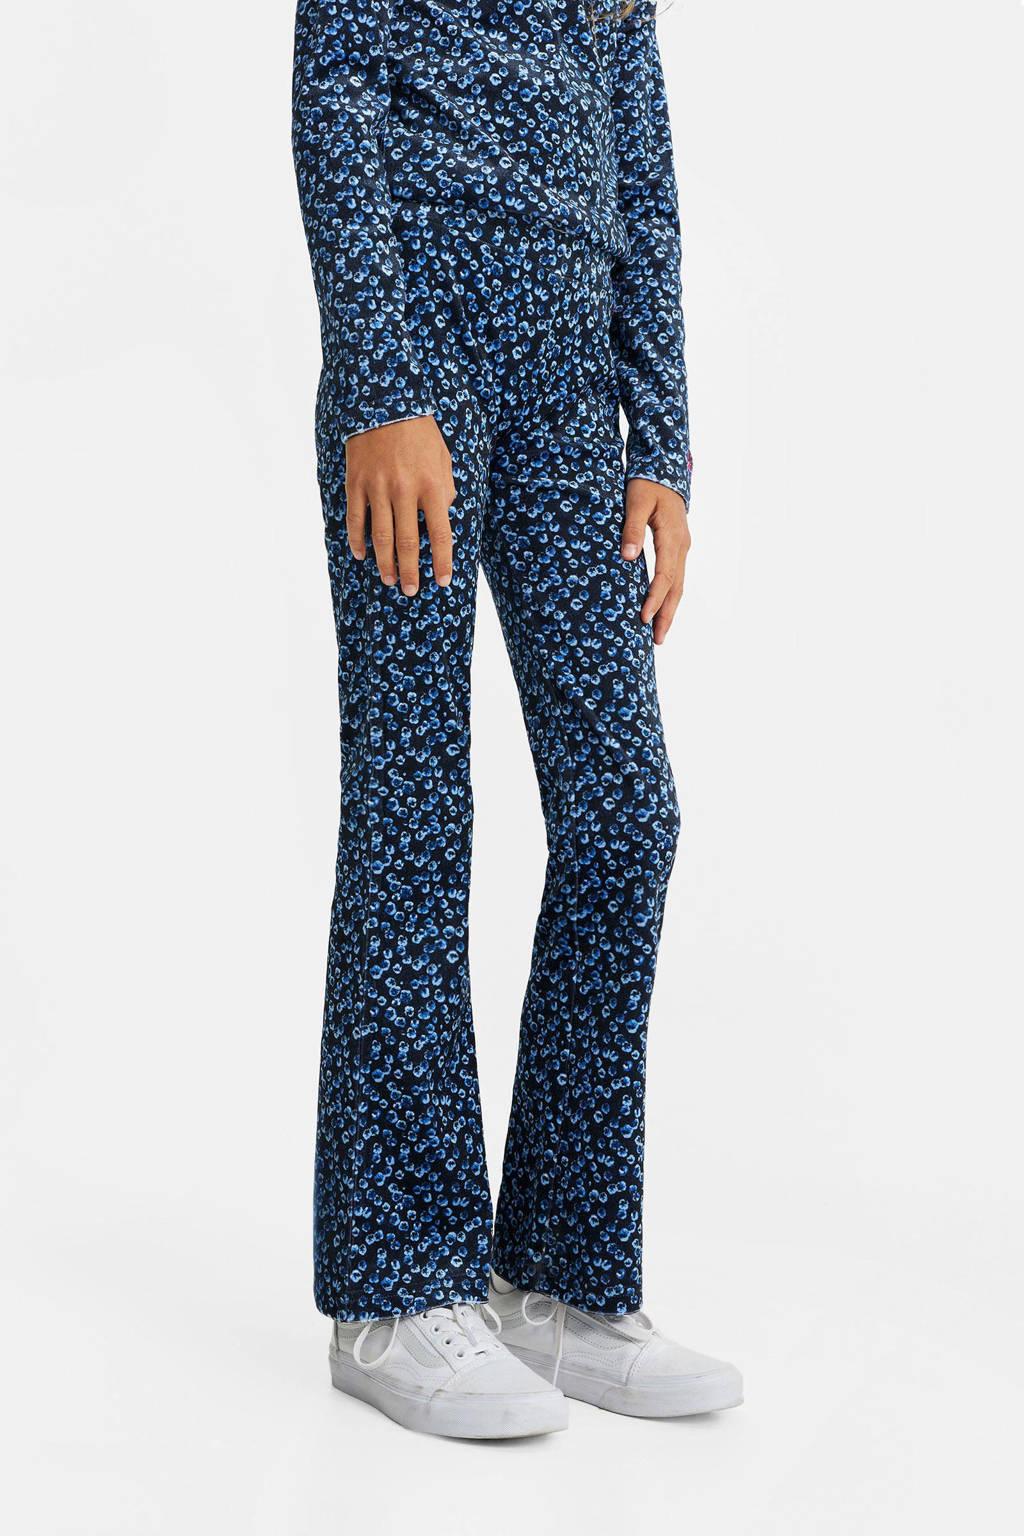 WE Fashion fluwelen broek met all over print donkerblauw/blauw, Donkerblauw/blauw